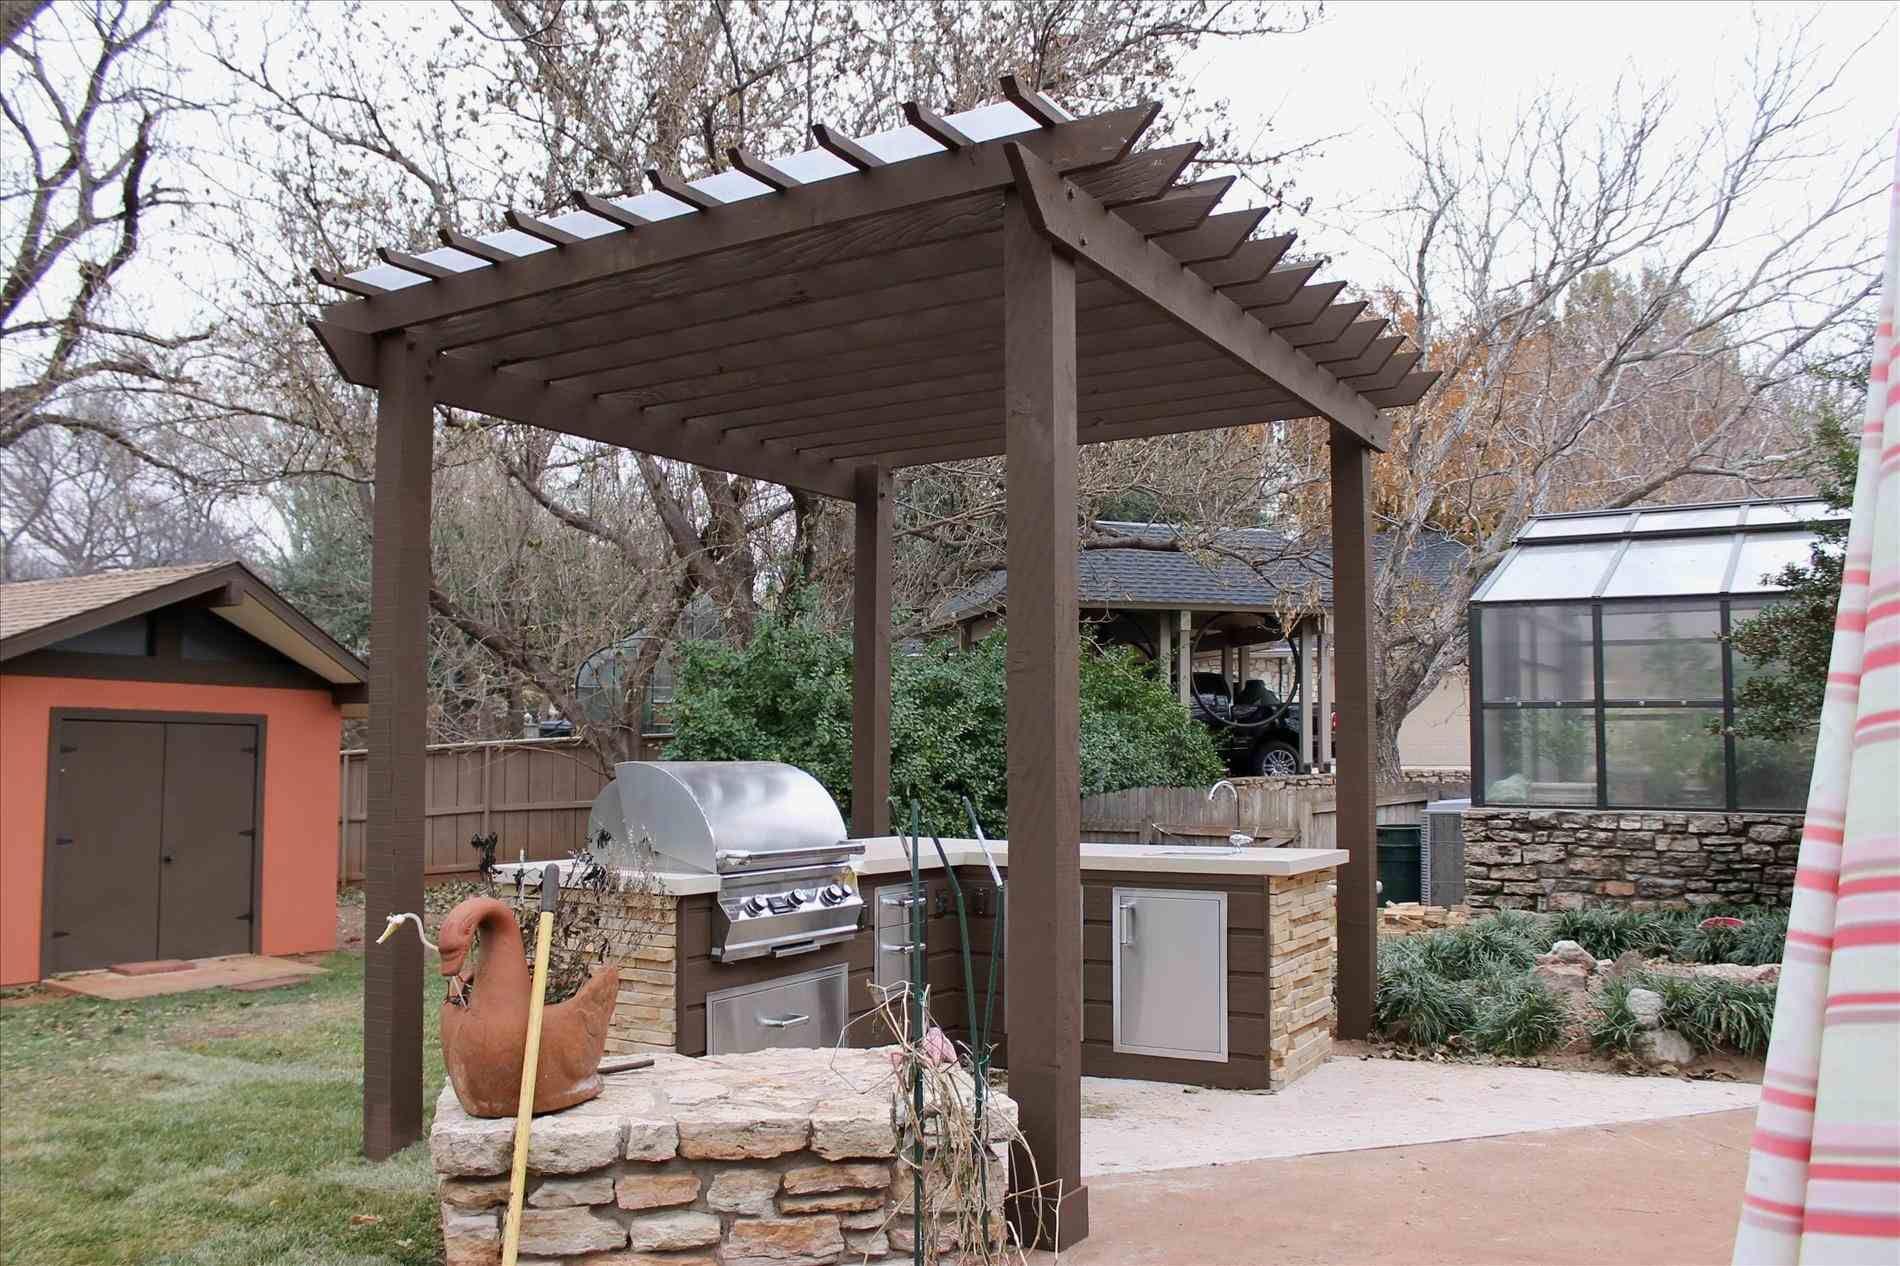 Backyard Bbq Pit Ideas | Backyard bbq pit, Backyard ...